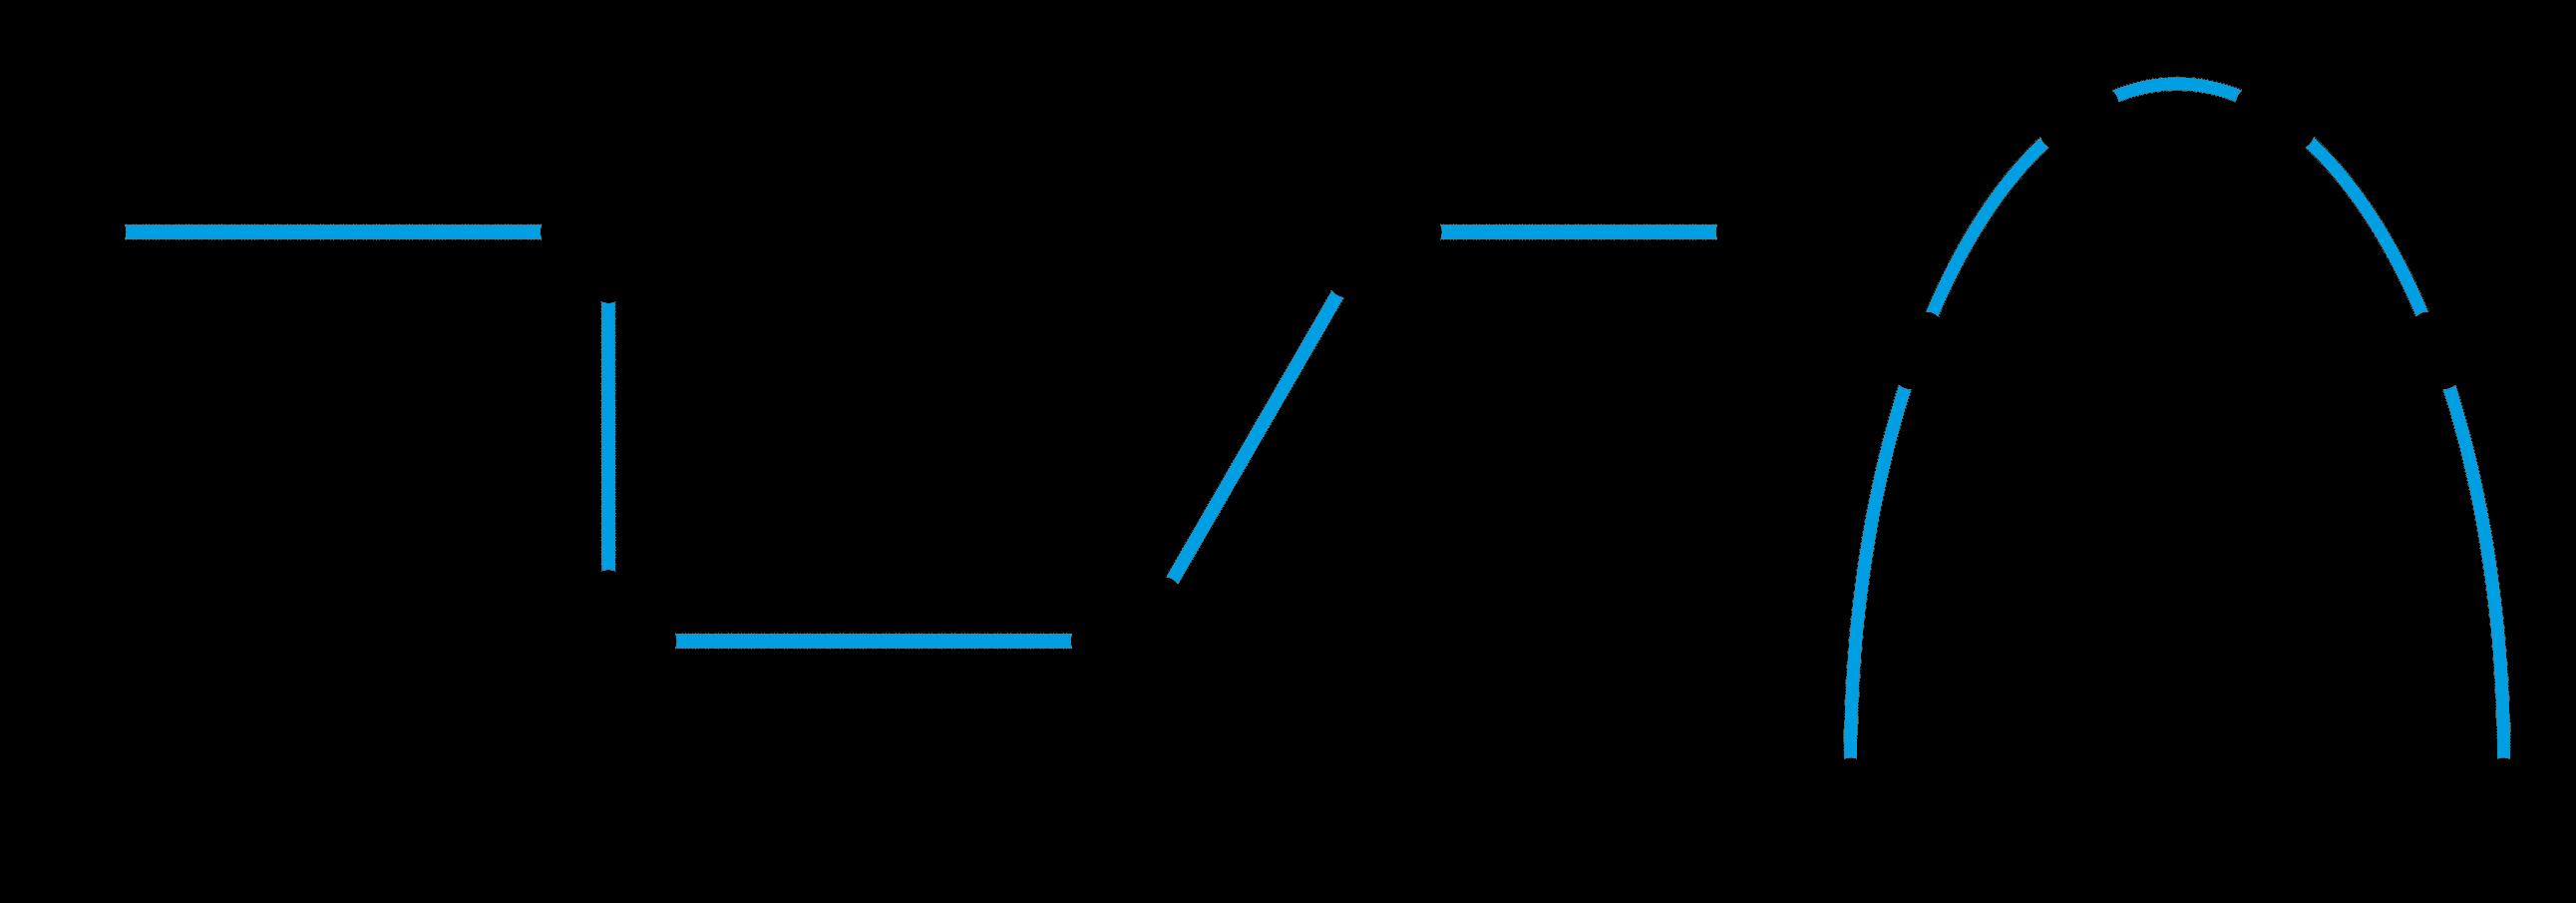 Formsensor-fuer-grosse-Objekte-Verbindungen